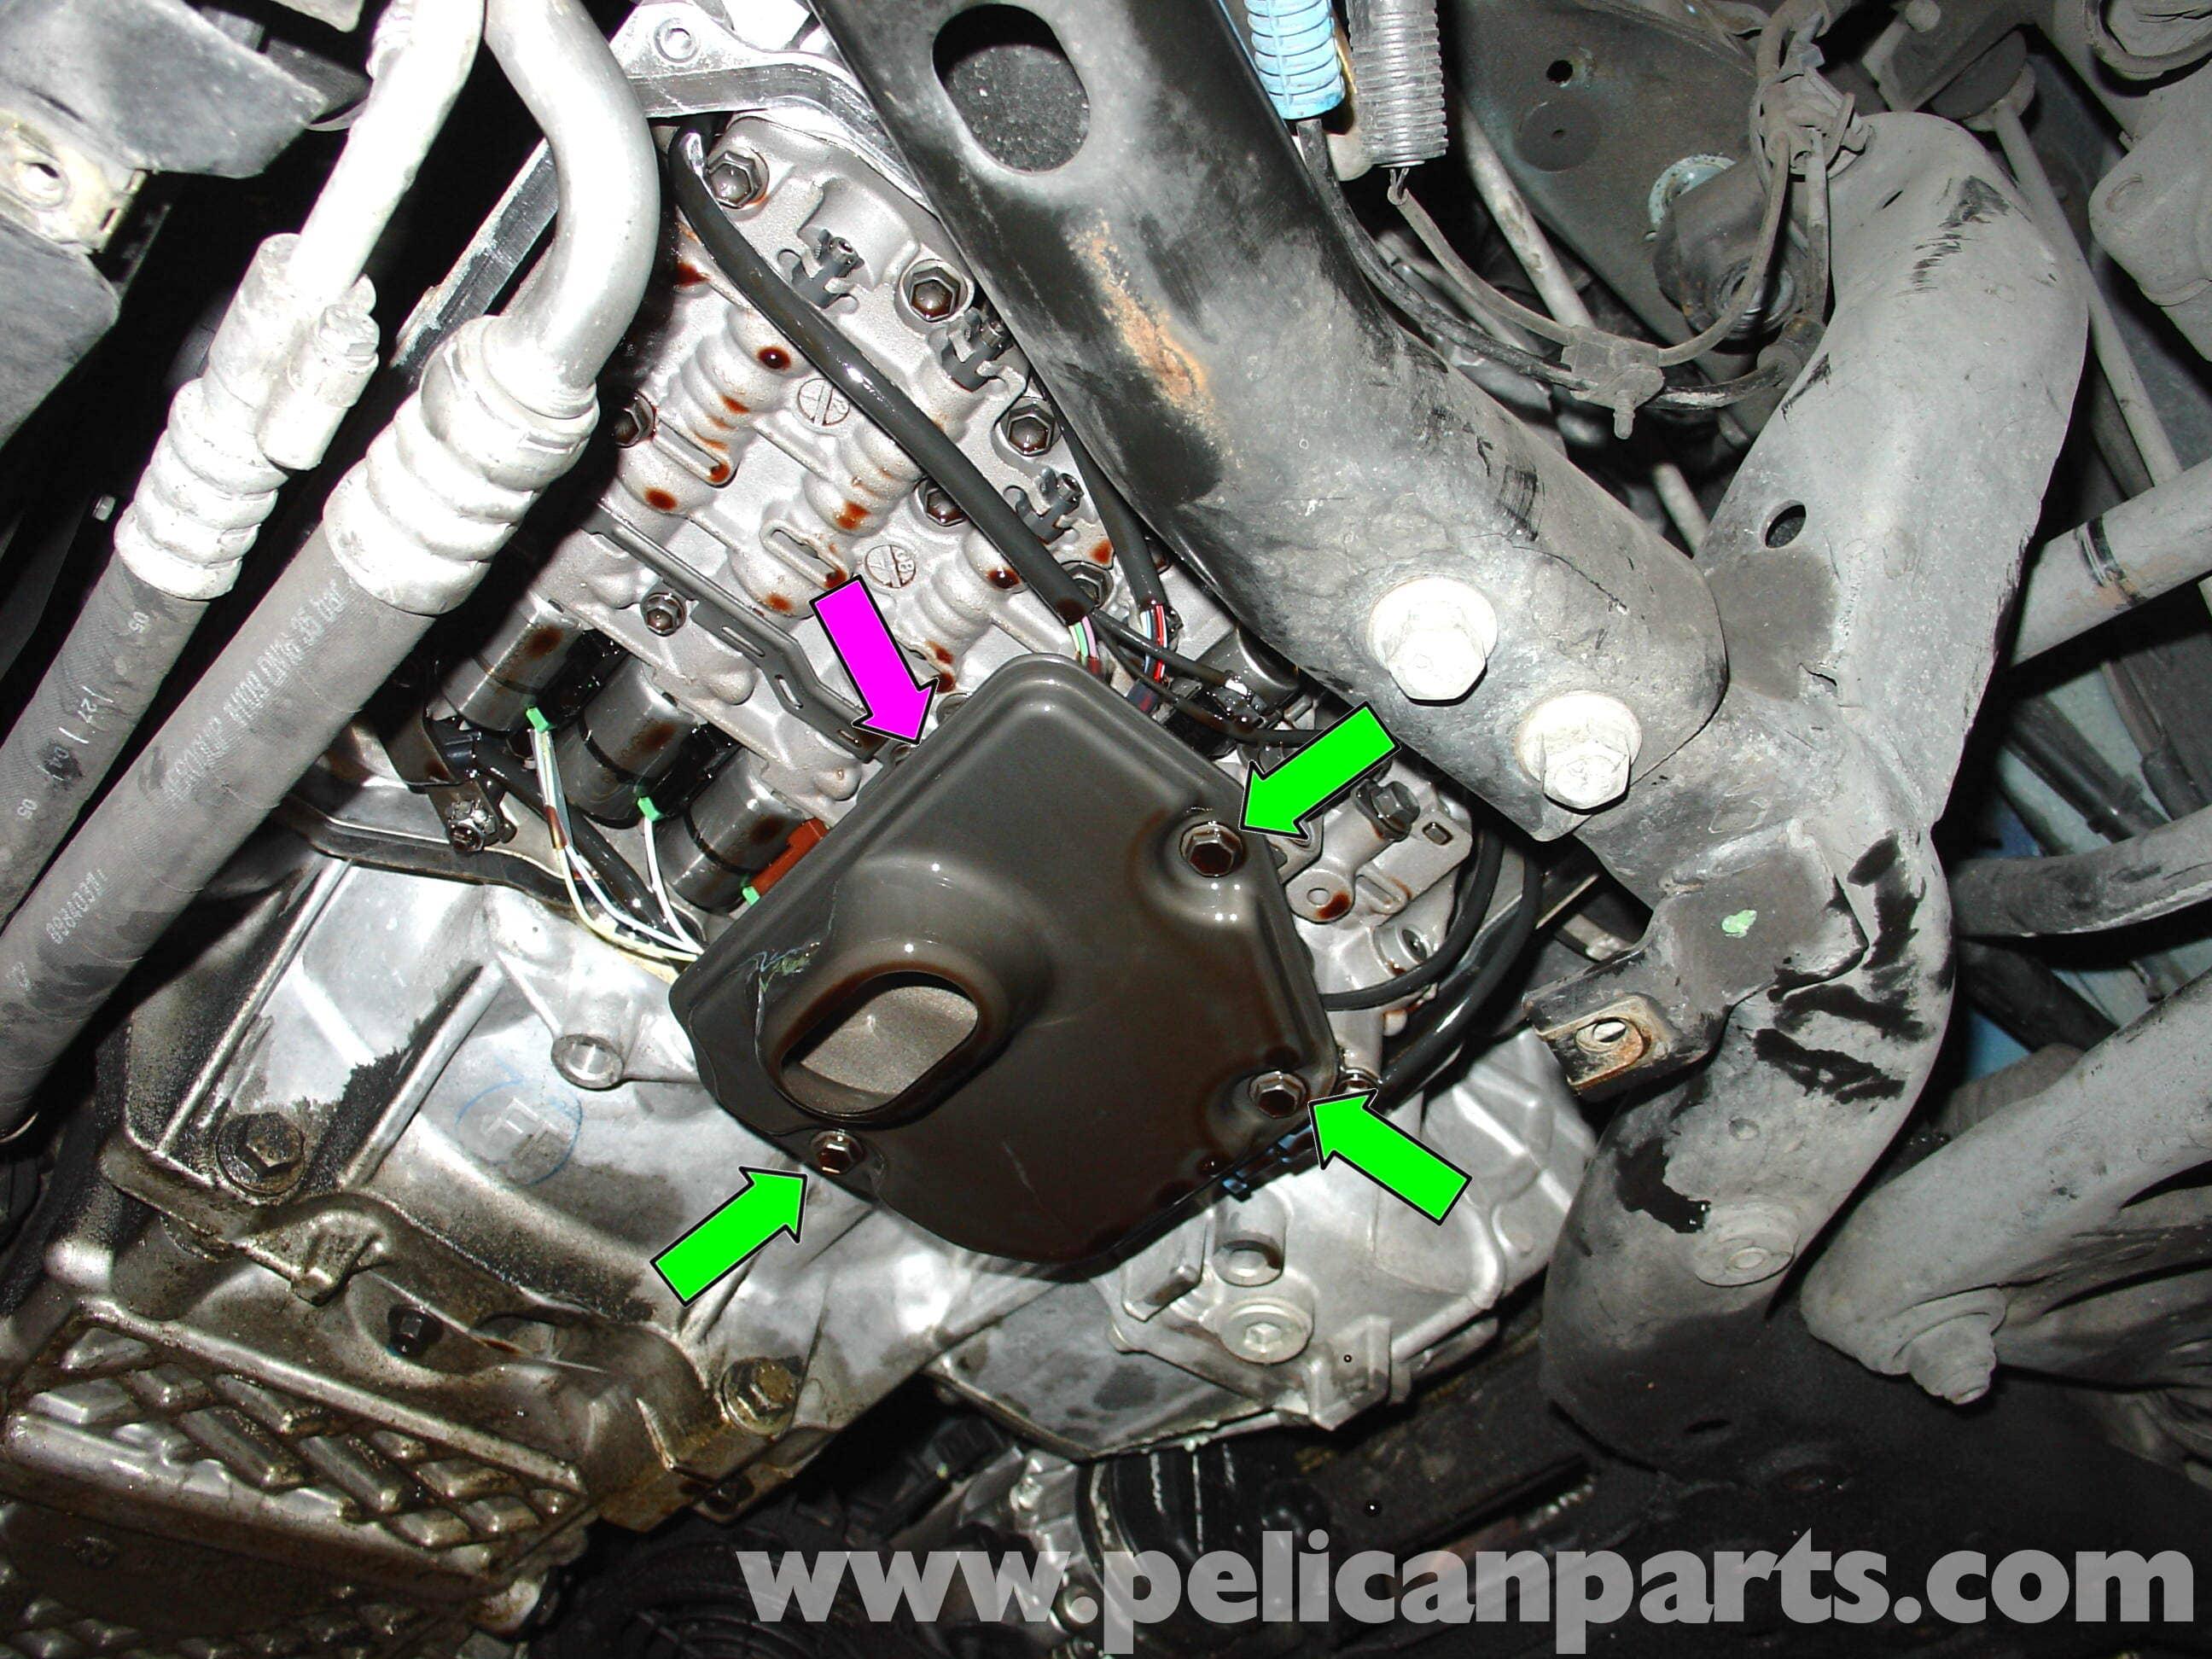 2007 nissan maxima engine diagram scion xb stereo wiring mini cooper automatic transmission fluid change (r50/r52/r53/r56/r57 2001-2015) | pelican parts ...